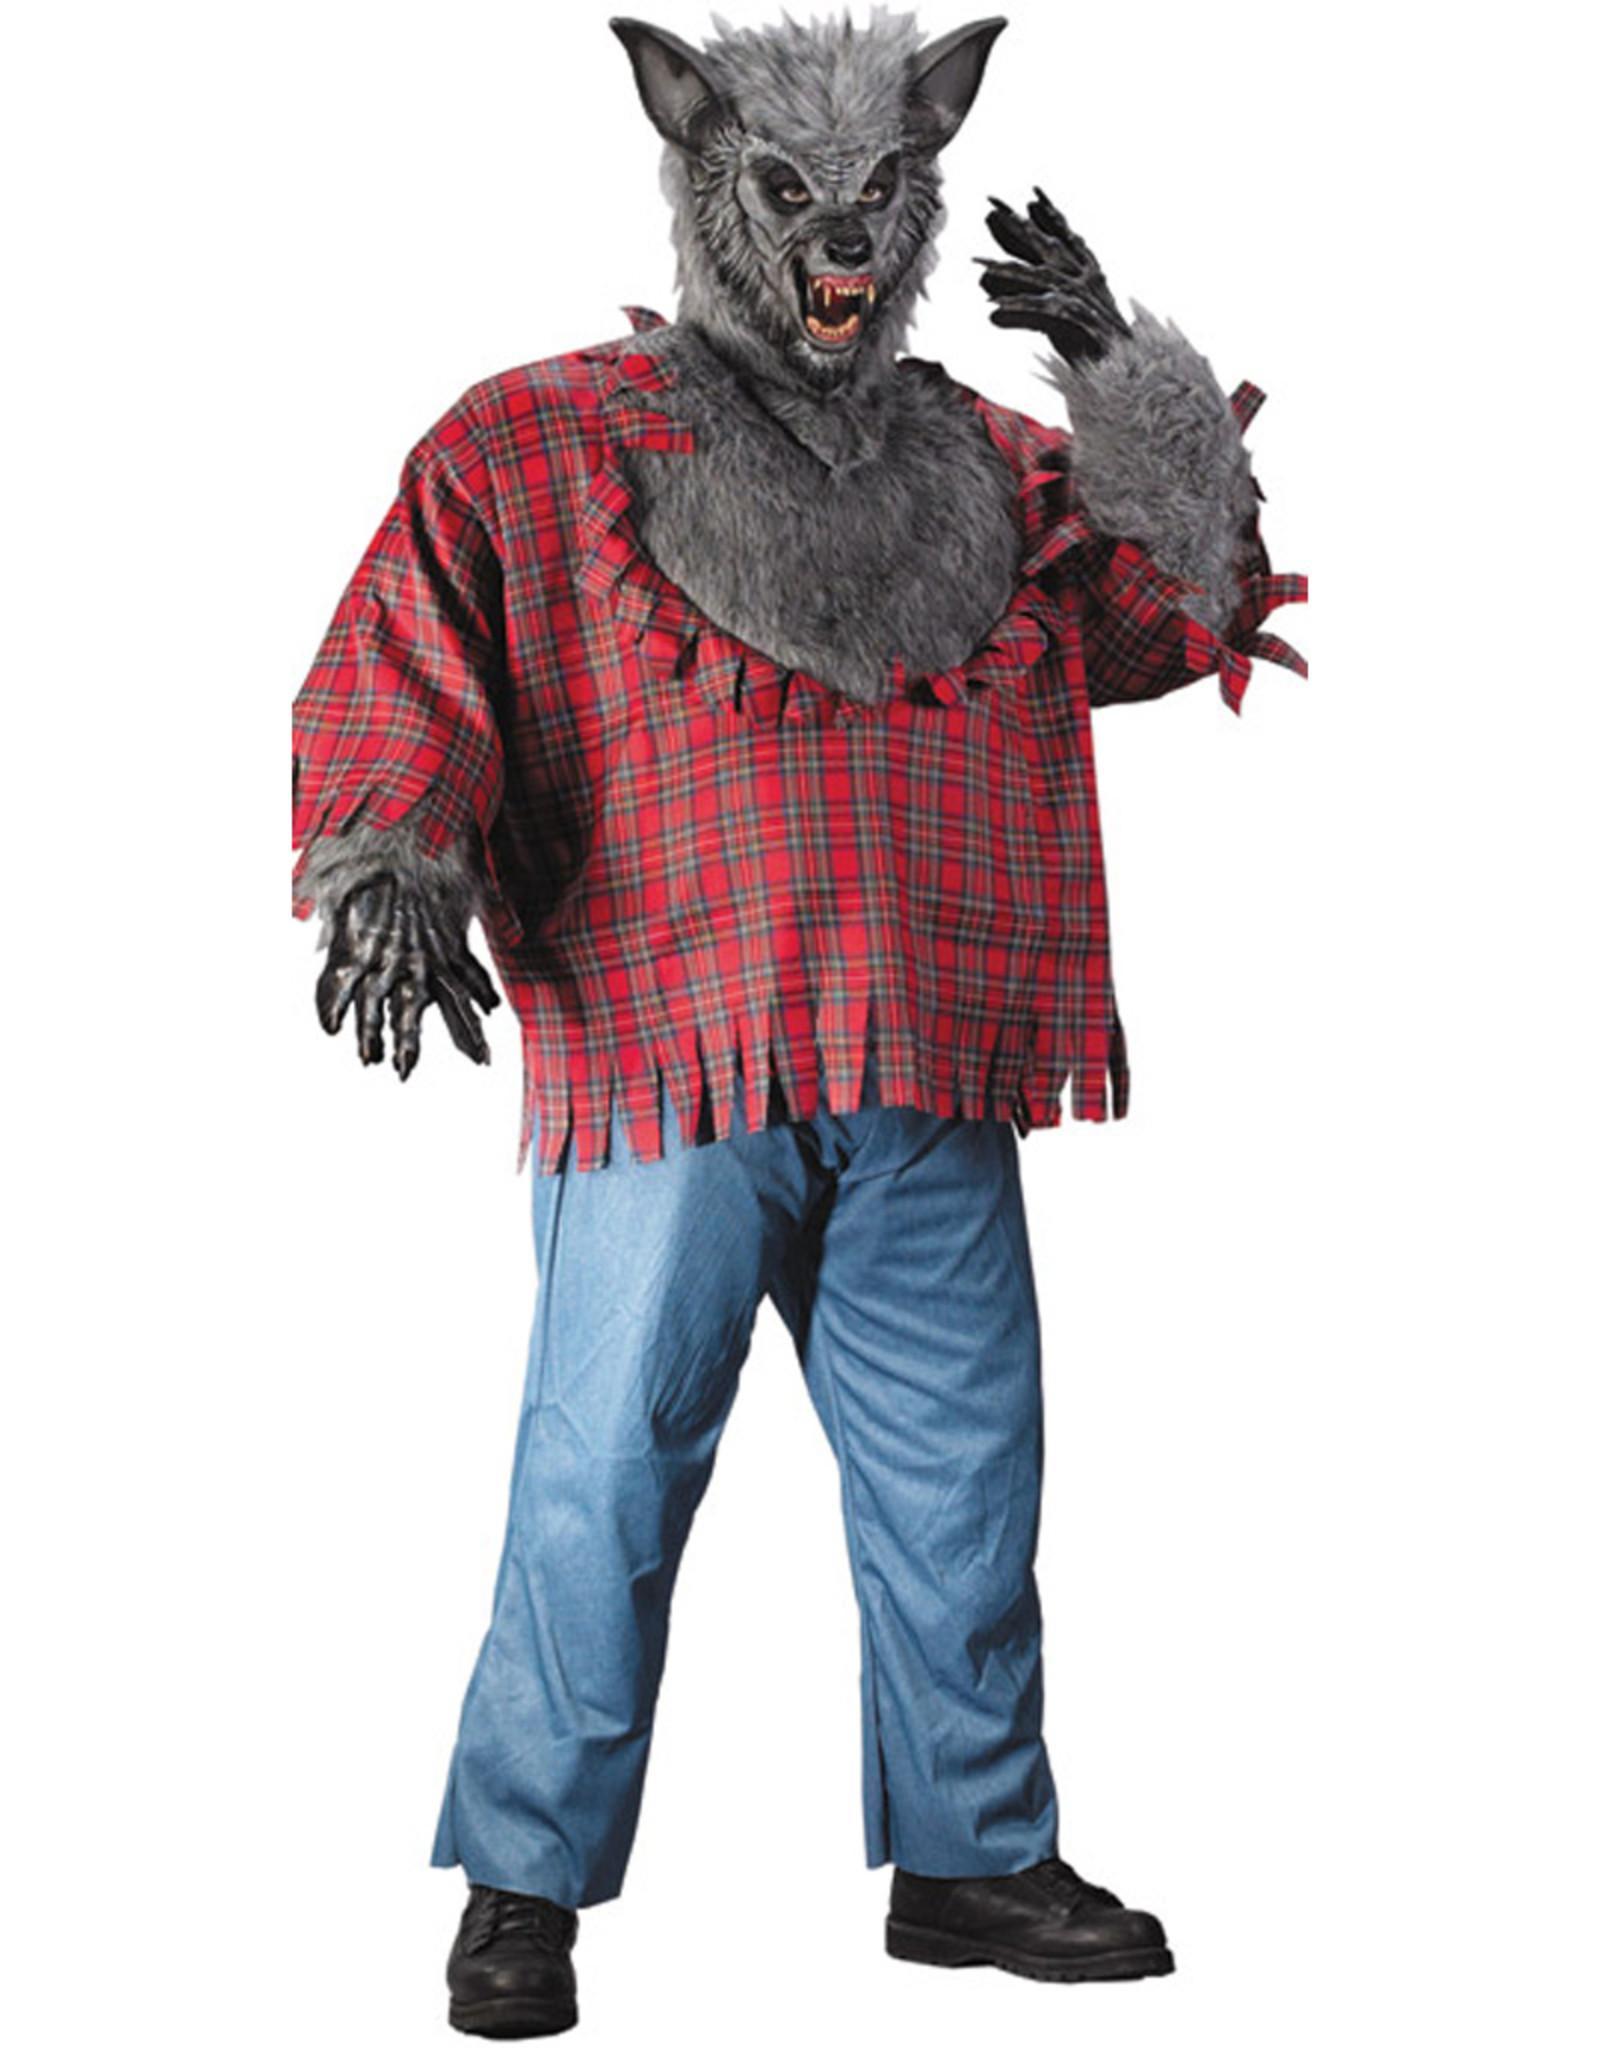 Werewolf Grey Costume - Men's Plus